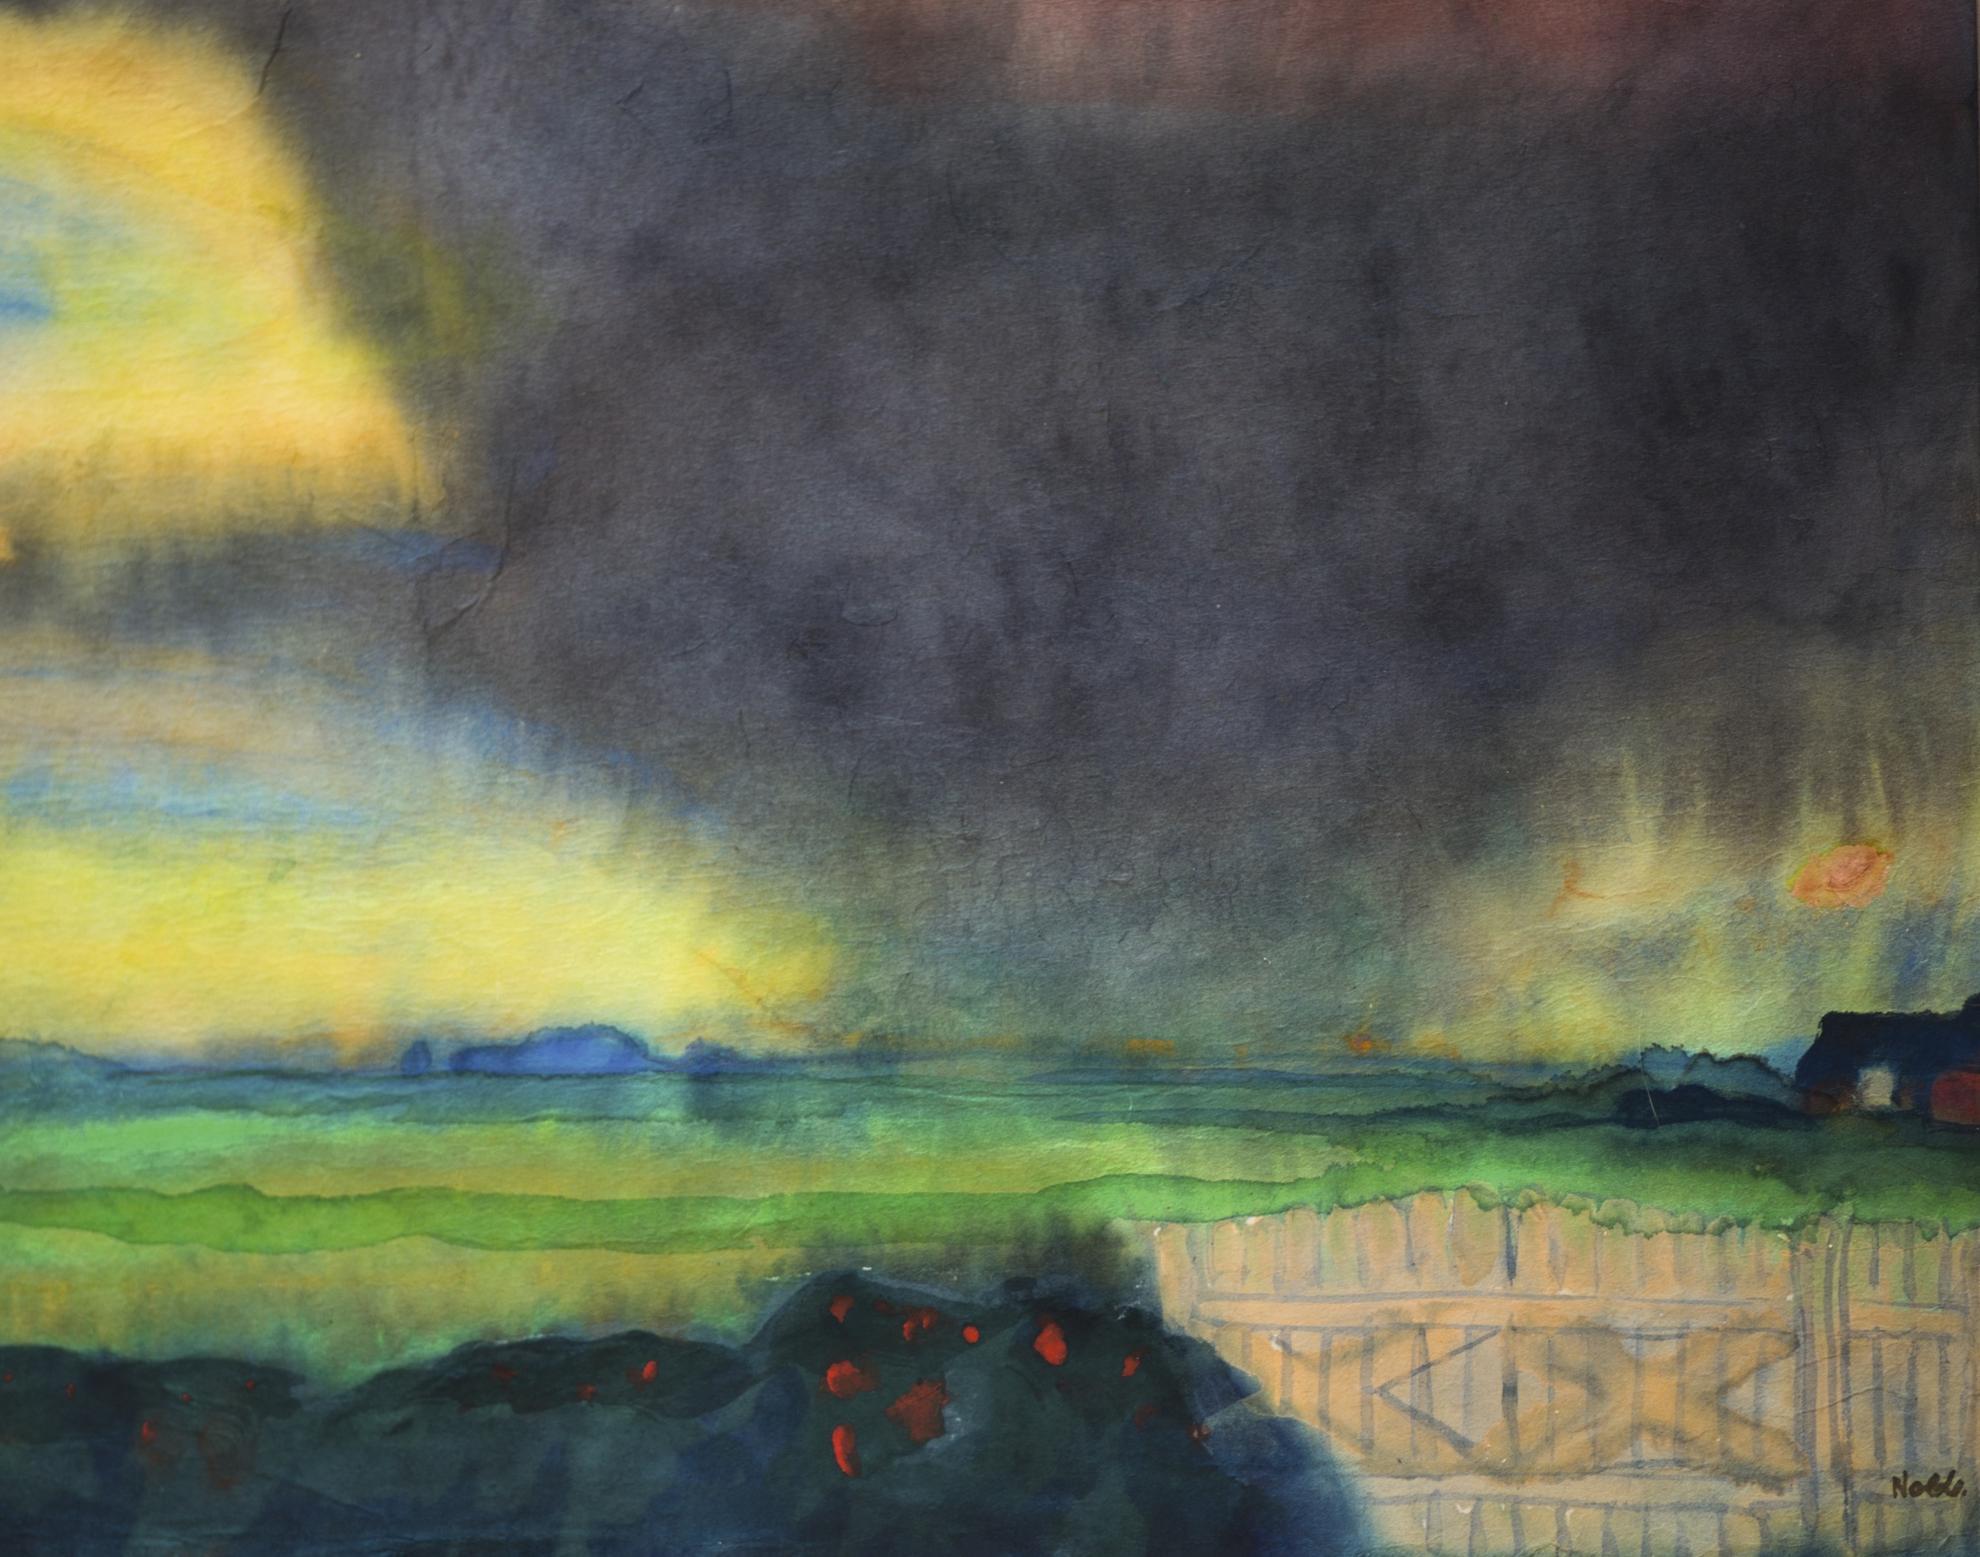 Emil Nolde-Marschlandschaft Mit Seebullhof Und Rosenhecke (Marshland With Seebull Grounds And Rose Hedge)-1940